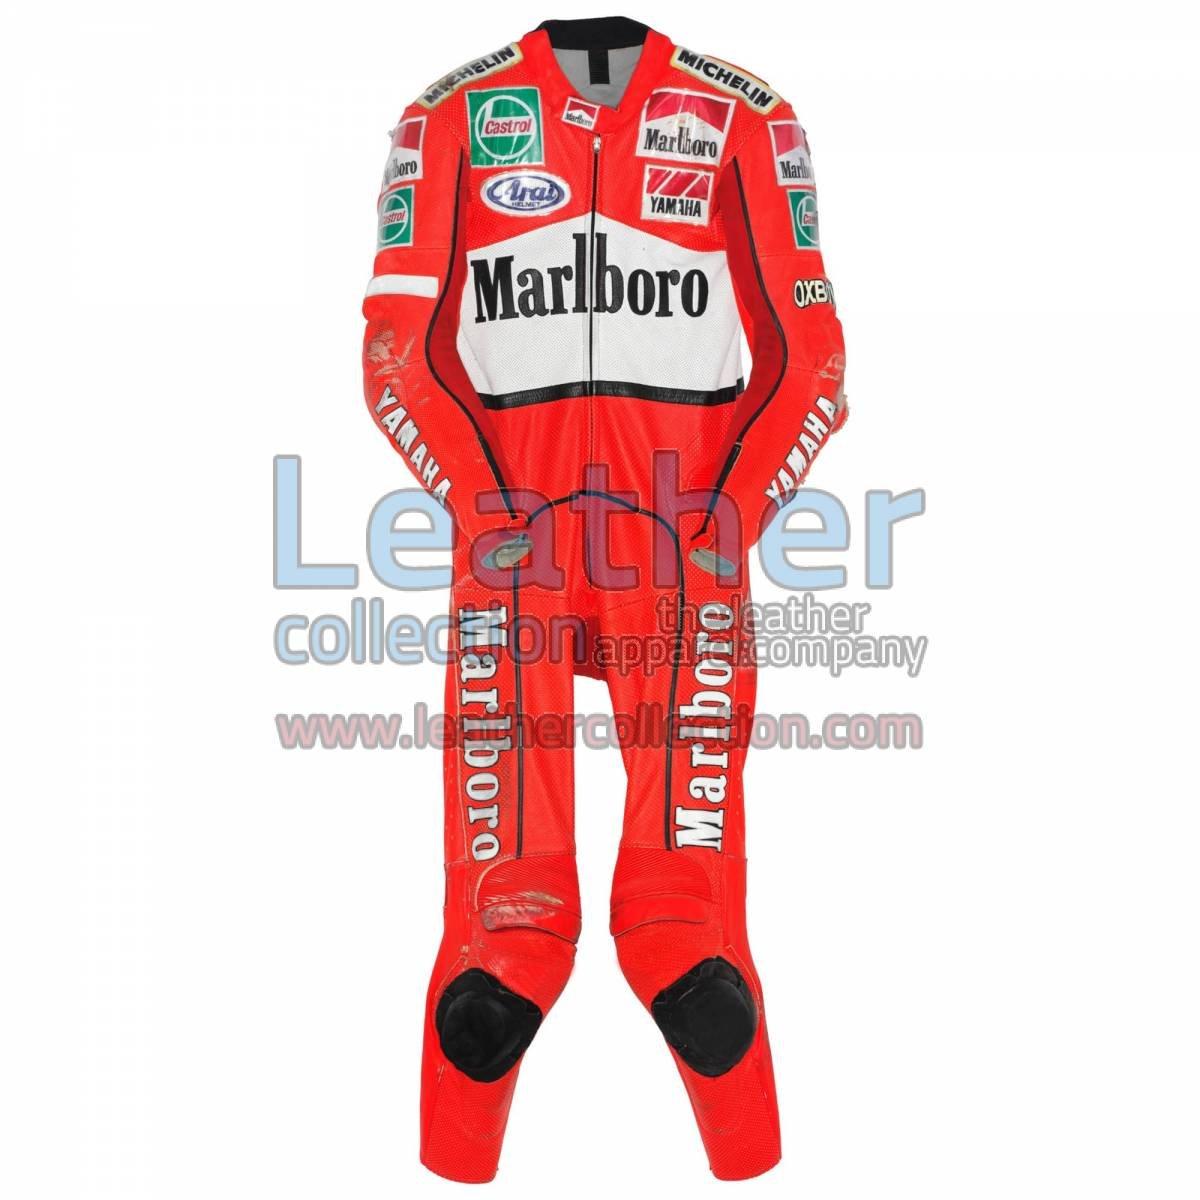 Jean Michel Bayle Marlboro Yamaha GP 1996 Suit